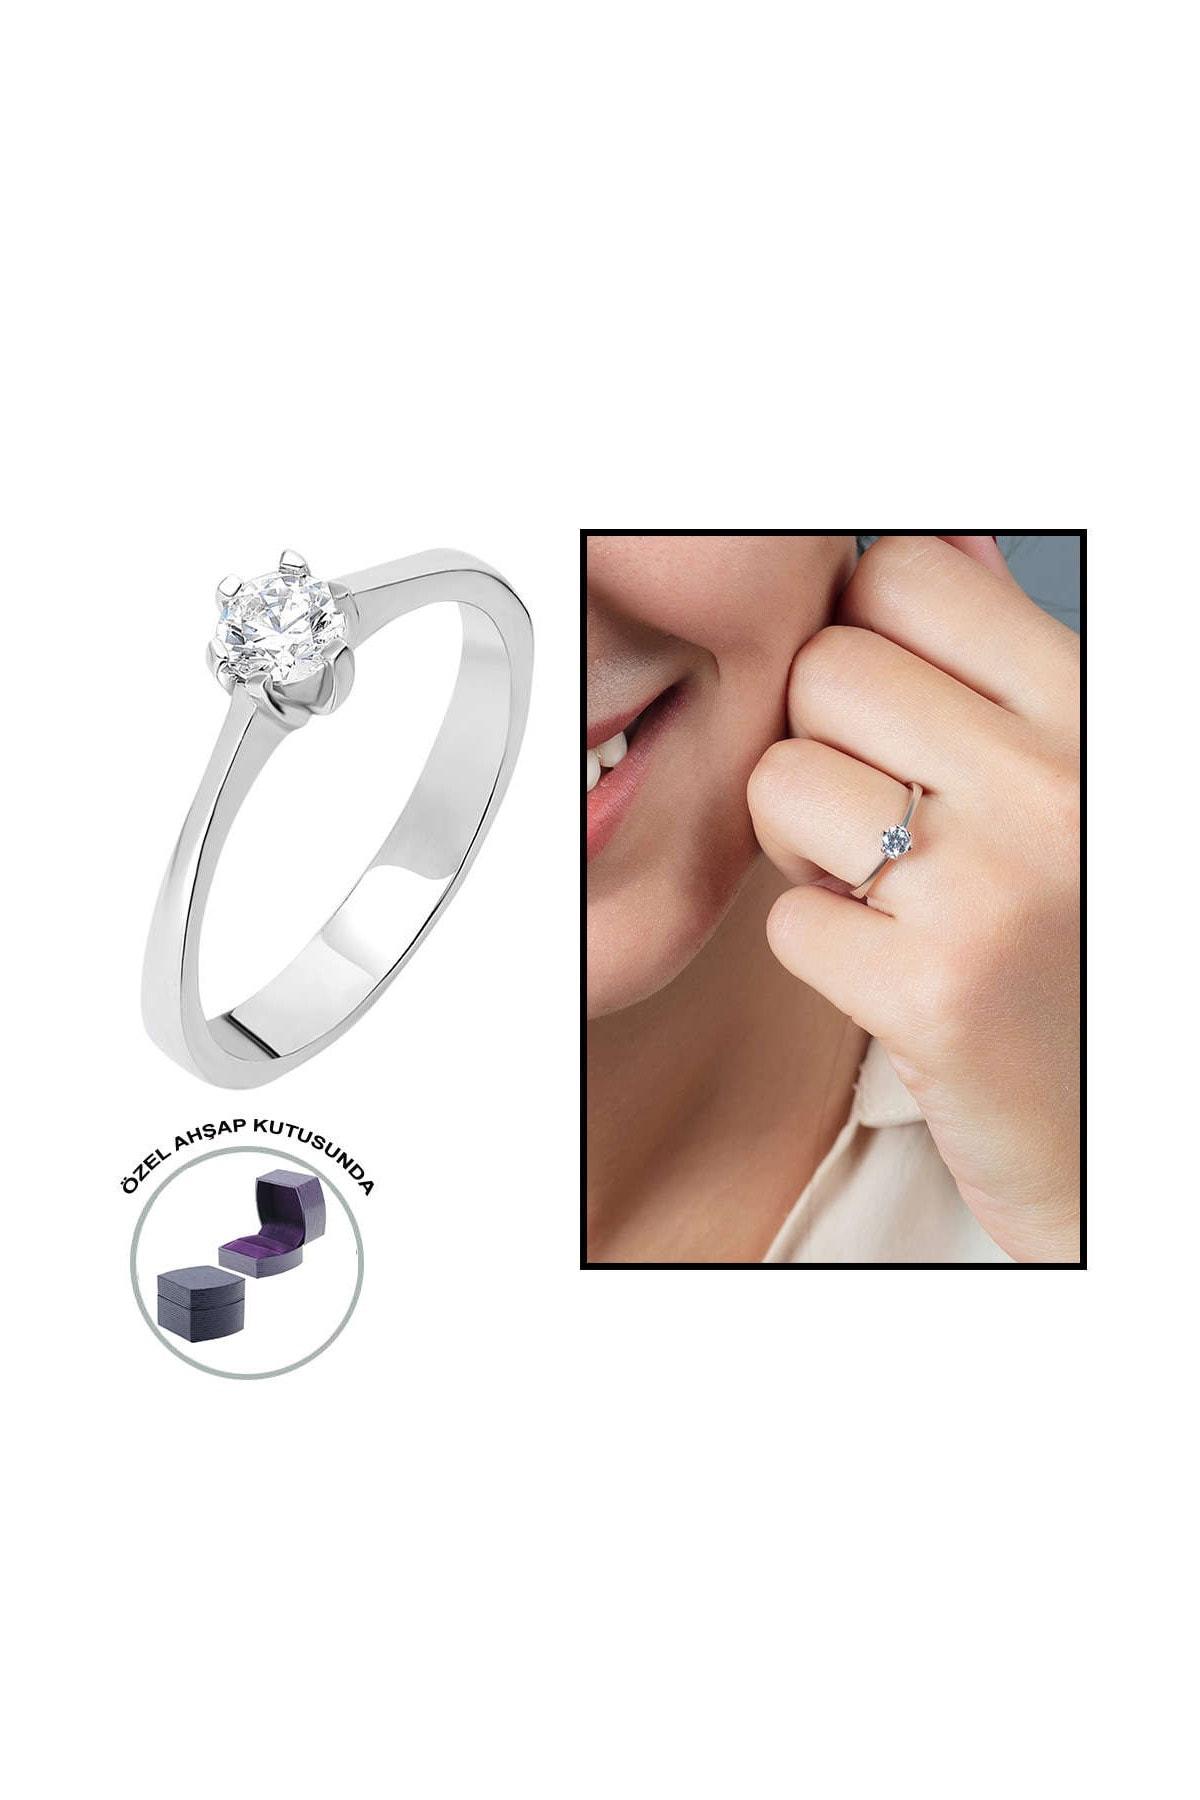 Tesbihane Starlight Diamond Pırlanta Montür Oval Tasarım 925 Ayar Gümüş Bayan Tektaş Yüzük 102001791 0